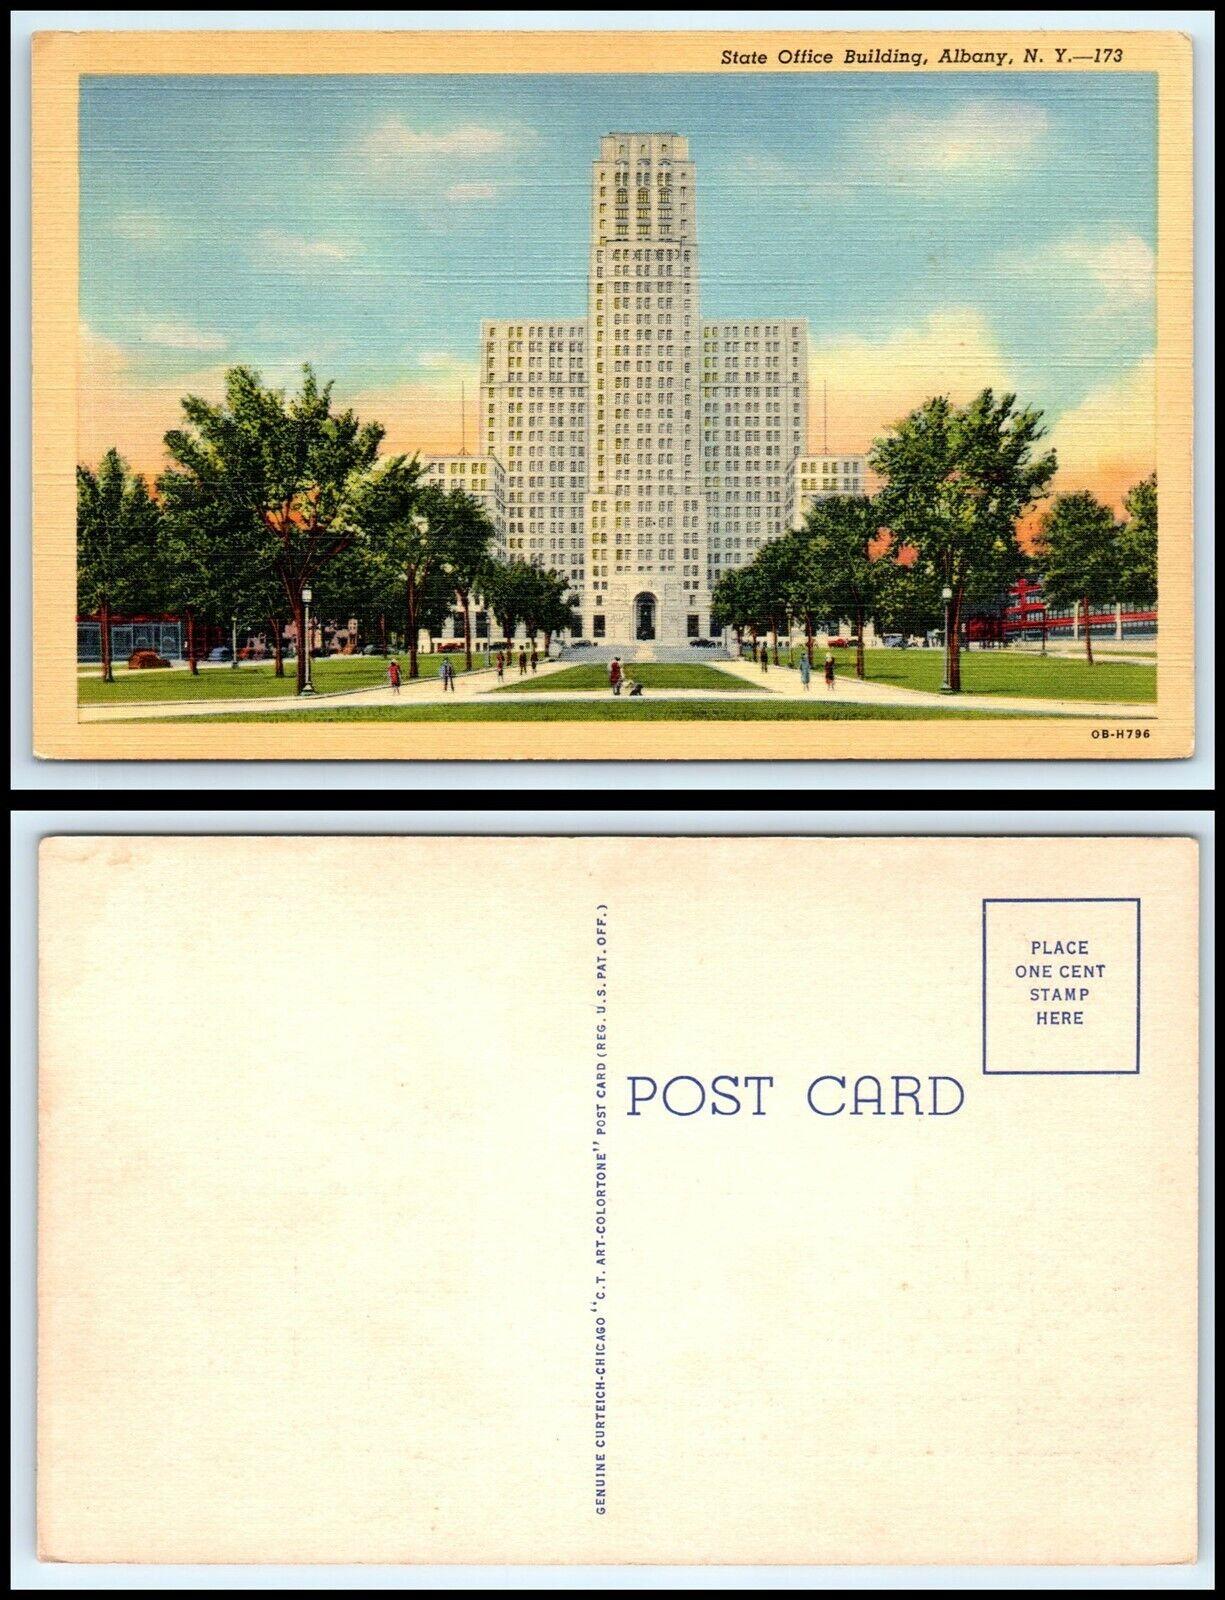 NEW YORK Postcard - Albany, State Office Buildings N4 | eBay